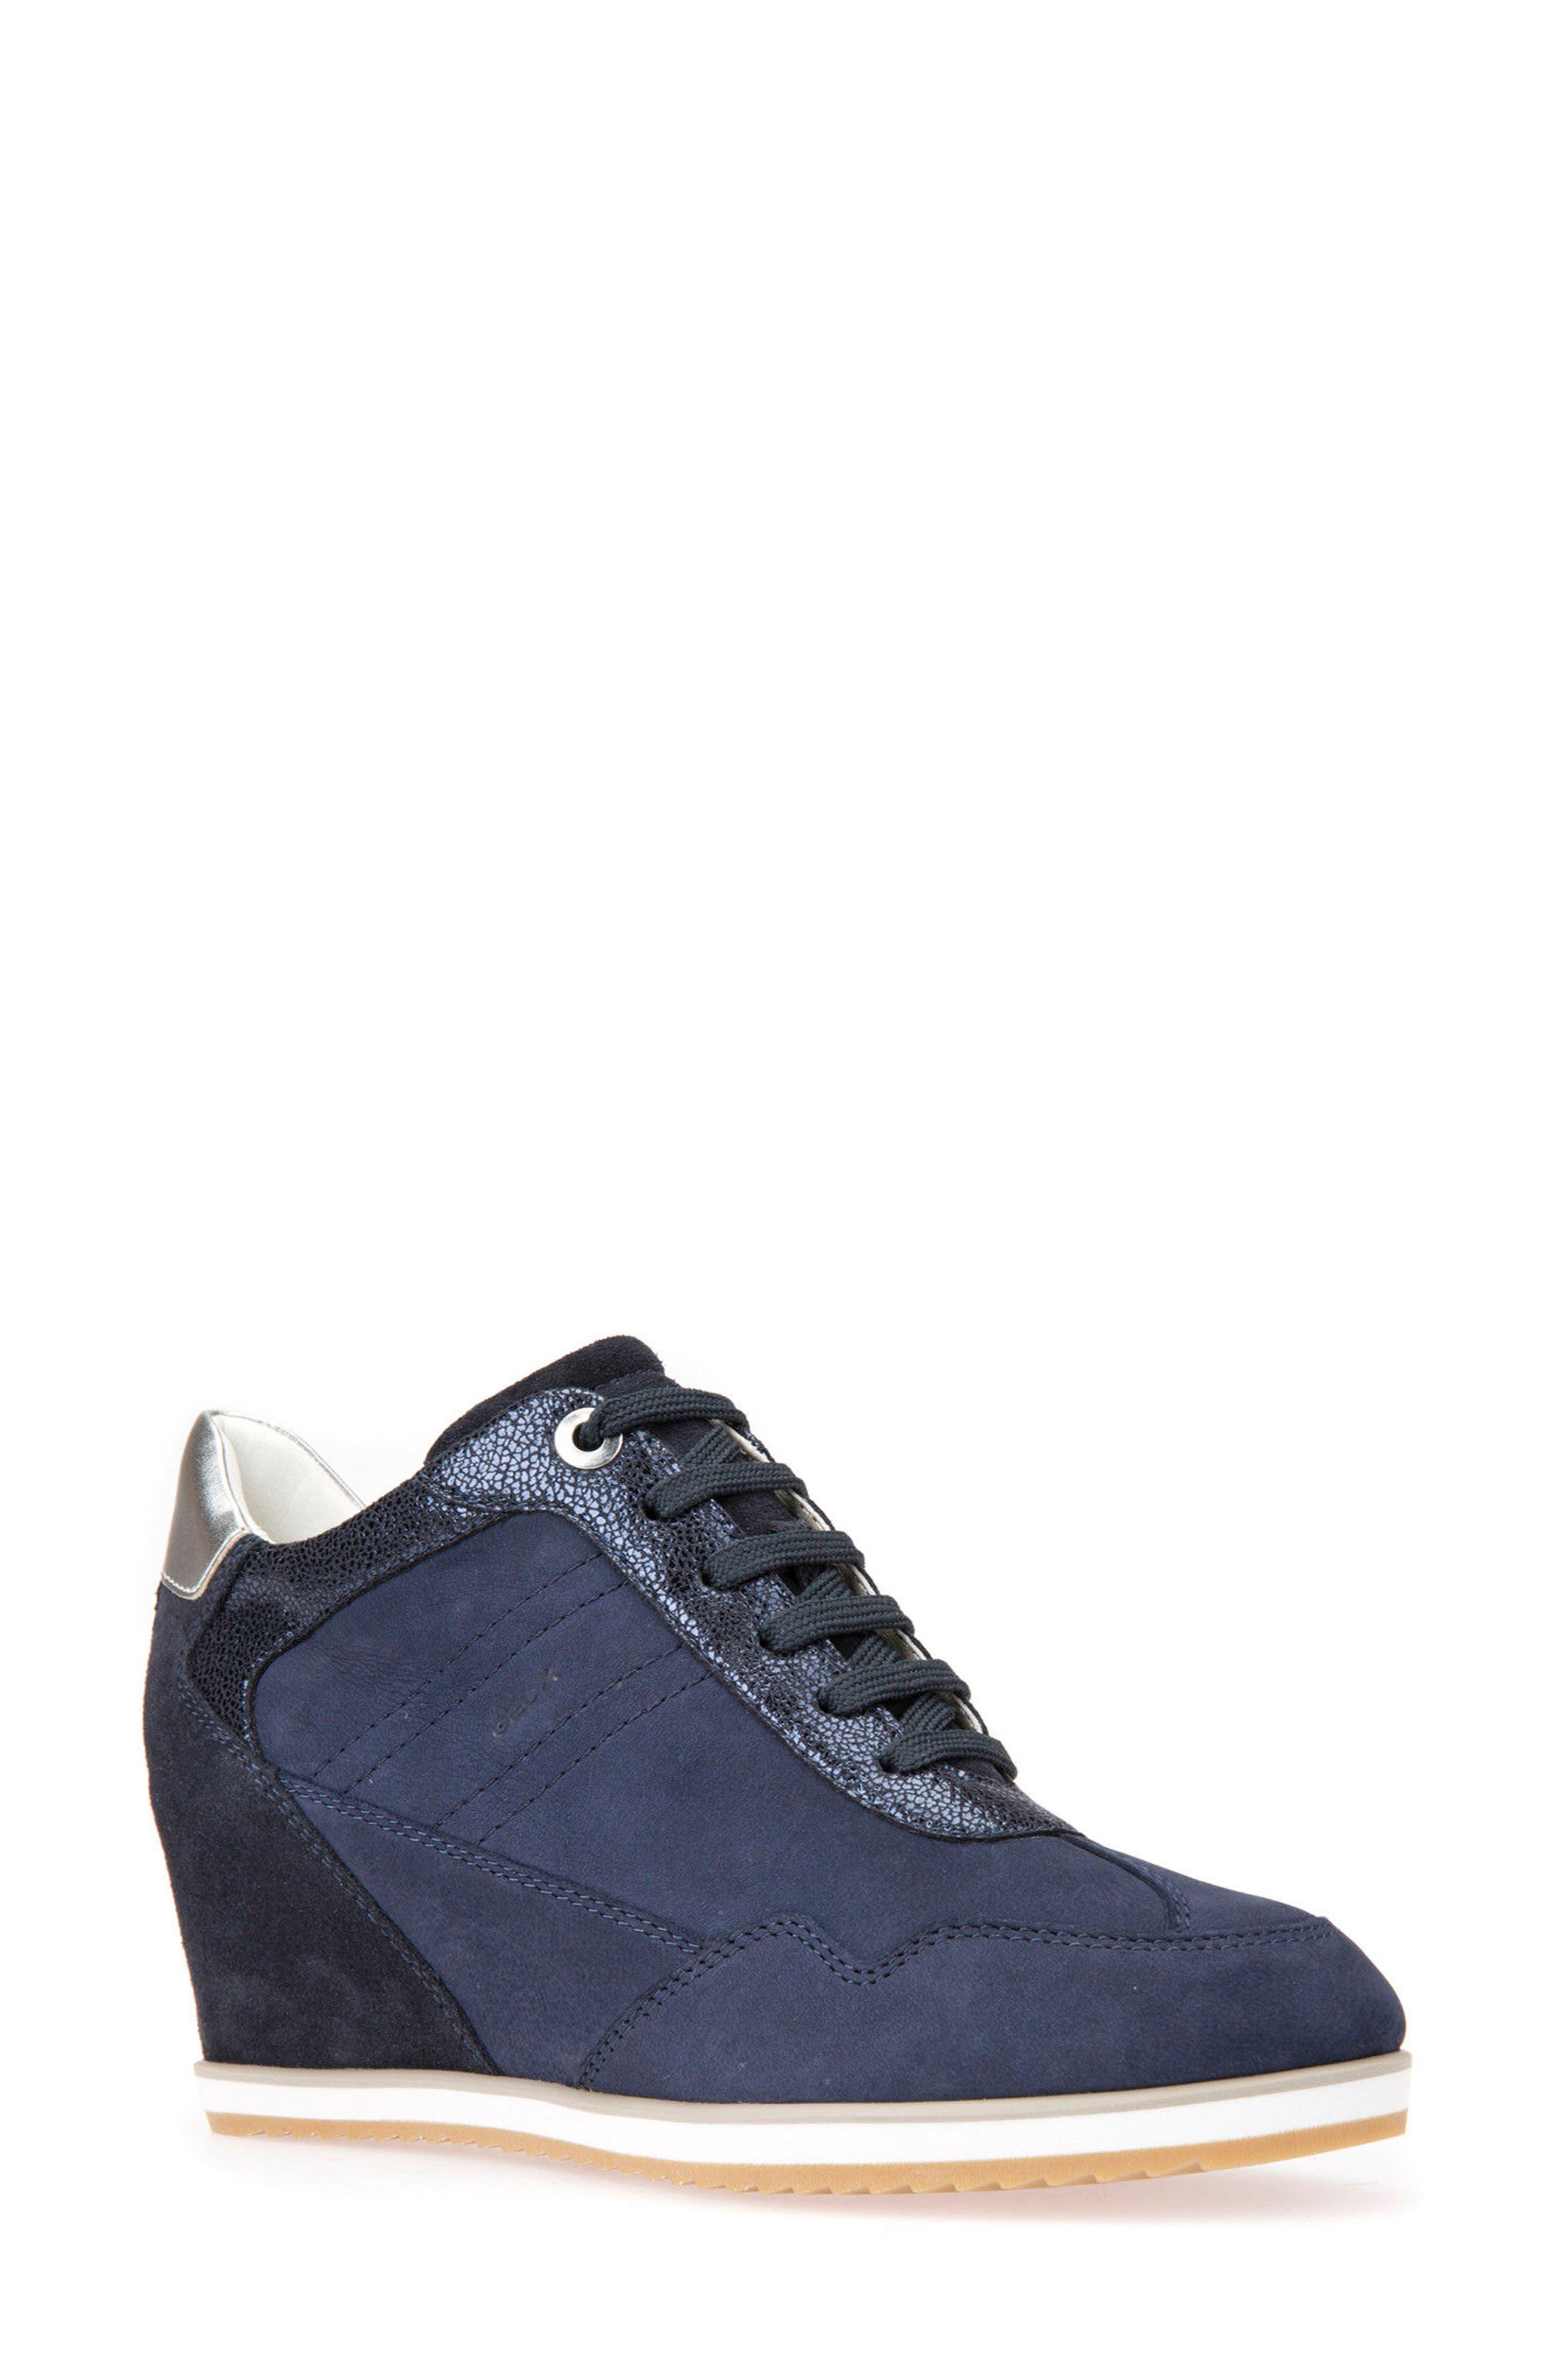 Alternate Image 1 Selected - Geox Illusion 34 Wedge Sneaker (Women)